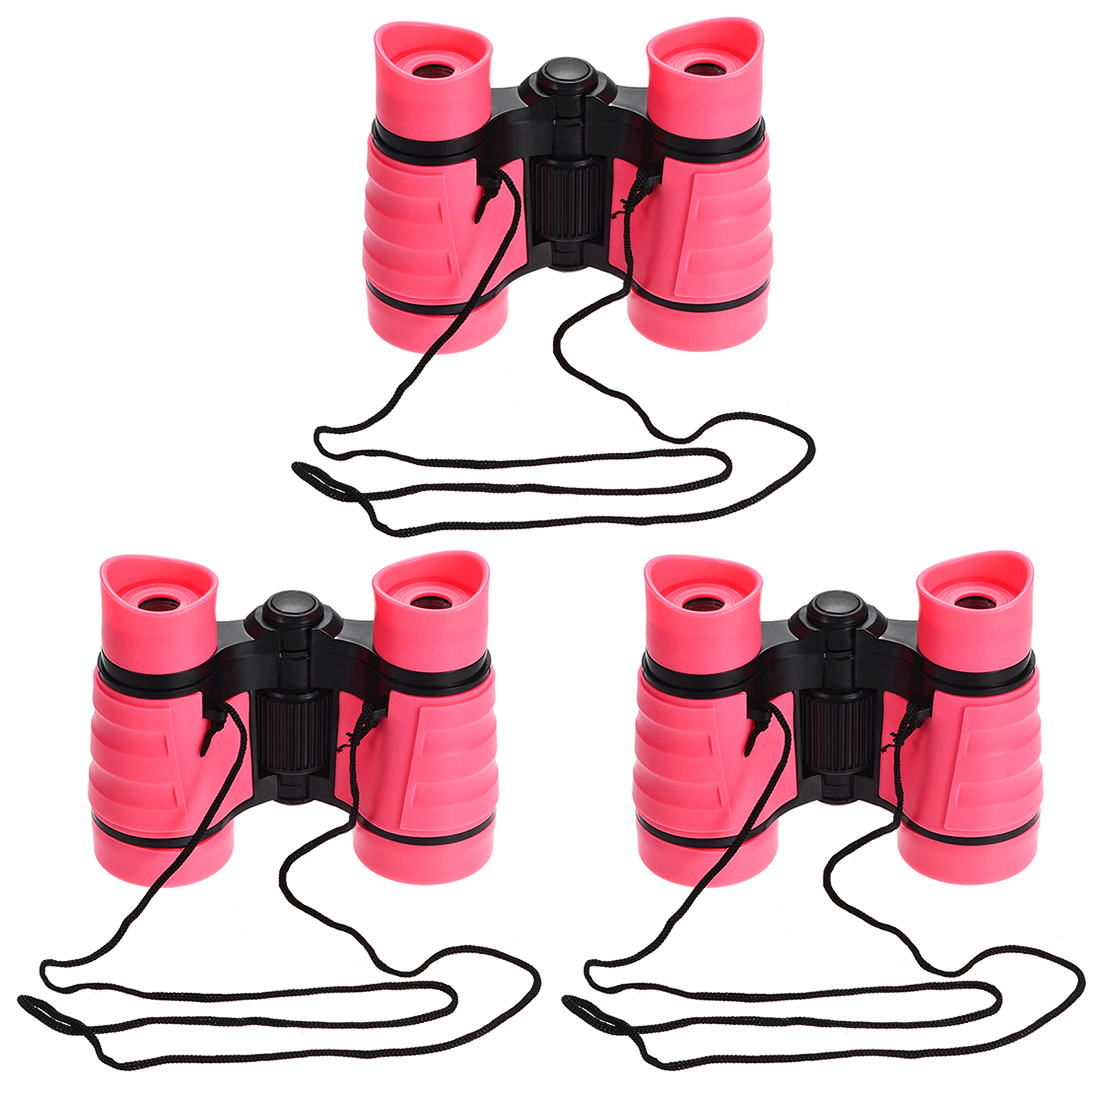 3pcs Toy Binoculars 4X30 Compact Foldable Binoculars Pink with Neck Strap